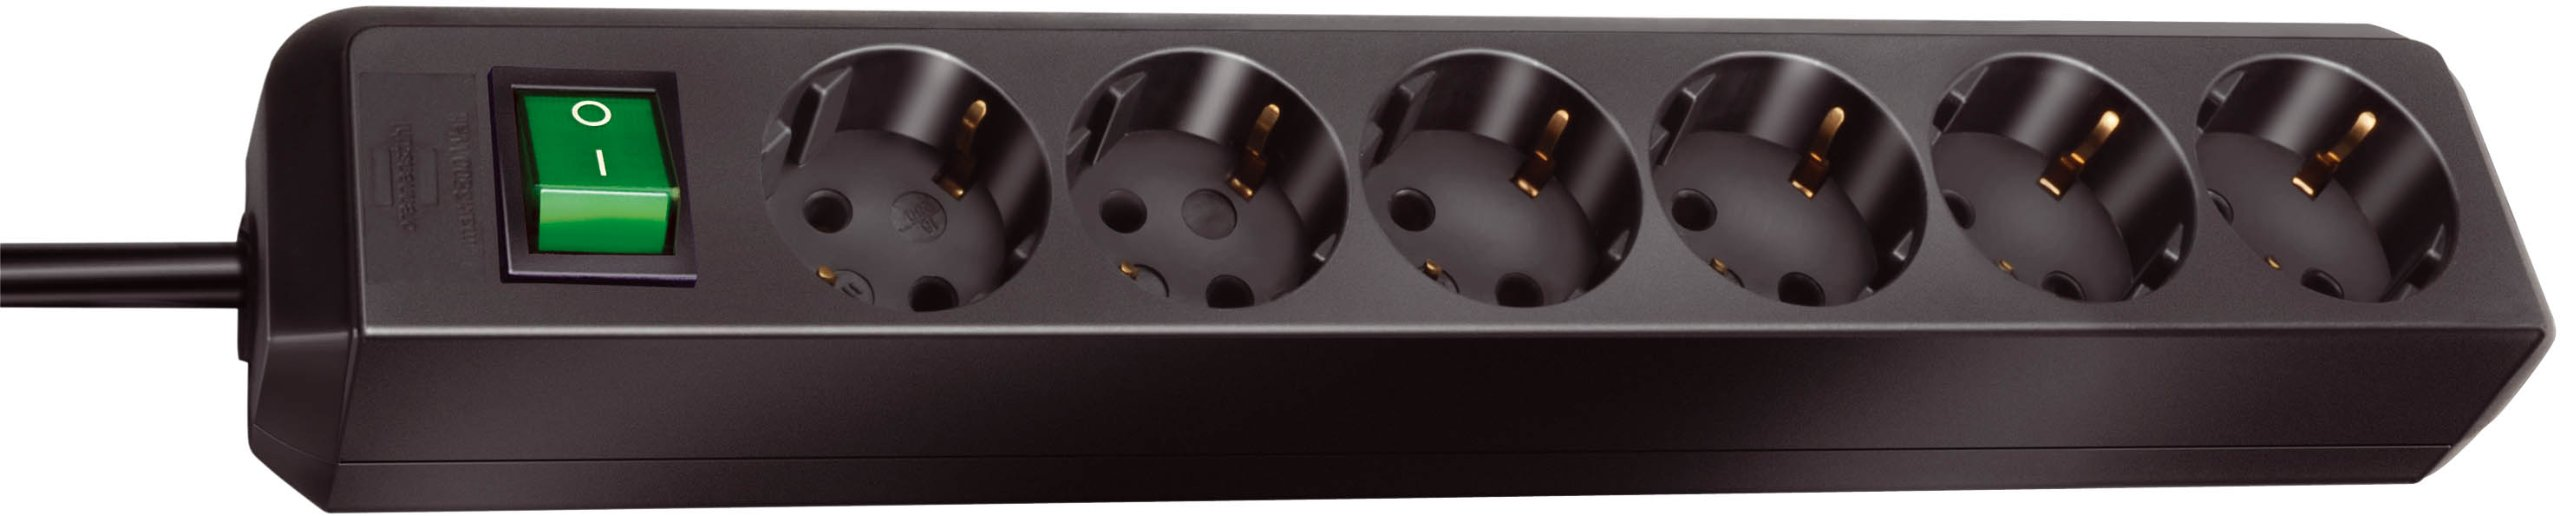 Brennenstuhl 149908 - Regleta con 6 tomas + interruptor, color negro product image